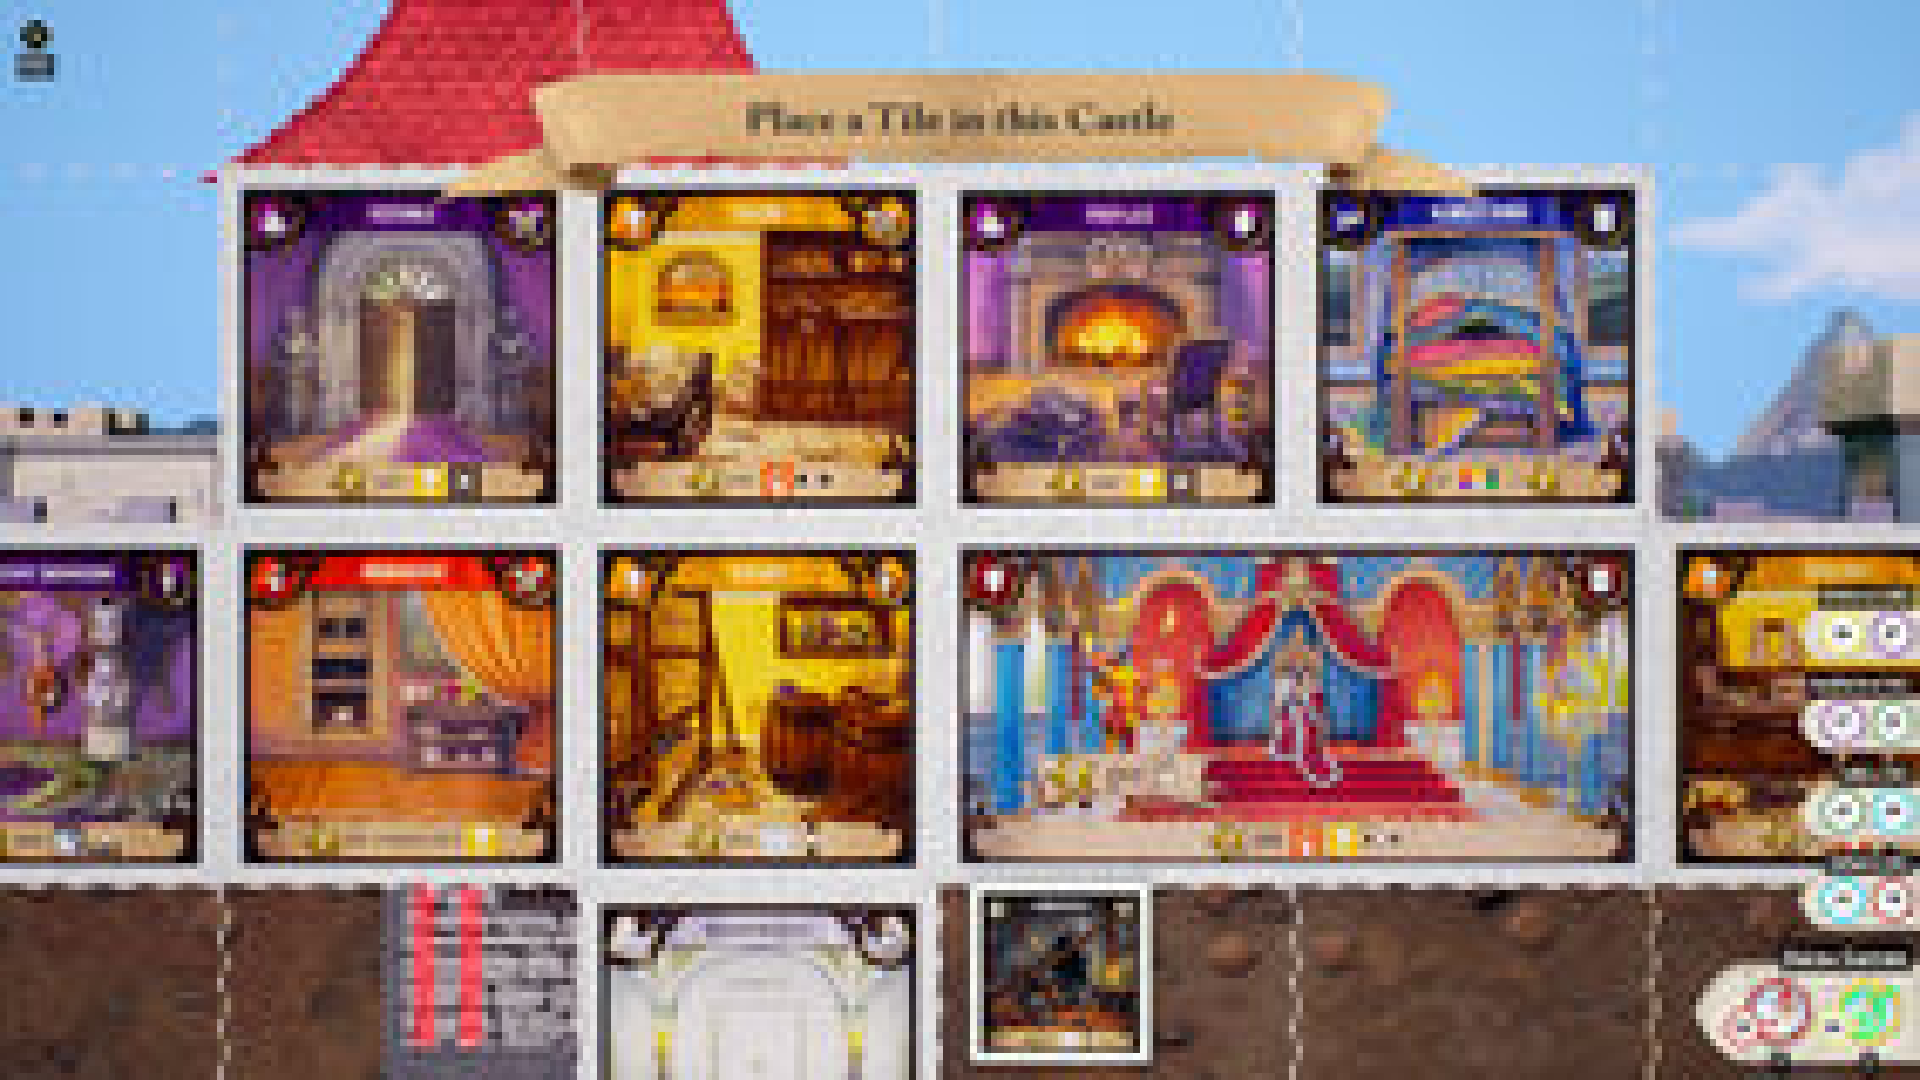 Between Two Castles Digital Edition Screenshot 1